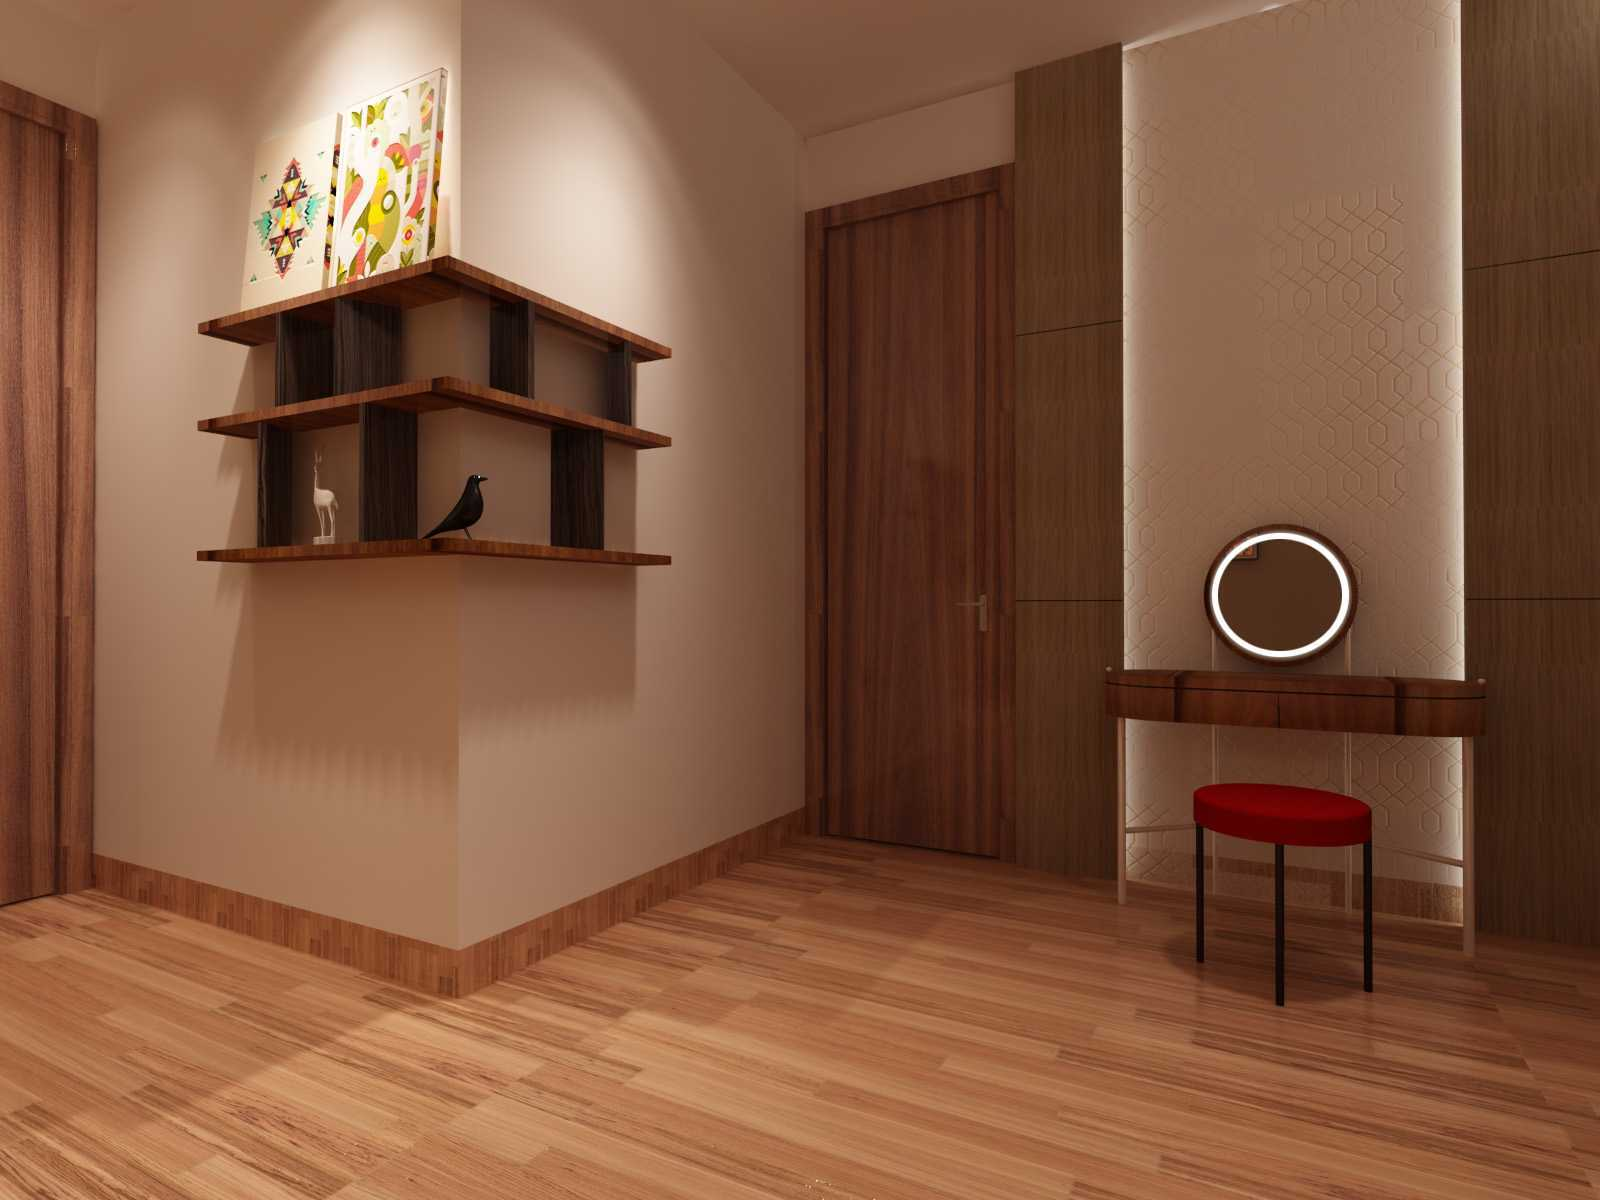 Koerie Design Vgi Residence Blok, Jl. Bgr. Boulevard Blok A2 No.3A, Rt.6/rw.14, West Kelapa Gading, Kelapa Gading, North Jakarta City, Jakarta 14240, Indonesia Blok, Jl. Bgr. Boulevard Blok A2 No.3A, Rt.6/rw.14, West Kelapa Gading, Kelapa Gading, North Jakarta City, Jakarta 14240, Indonesia Voyer Eklektik  40260